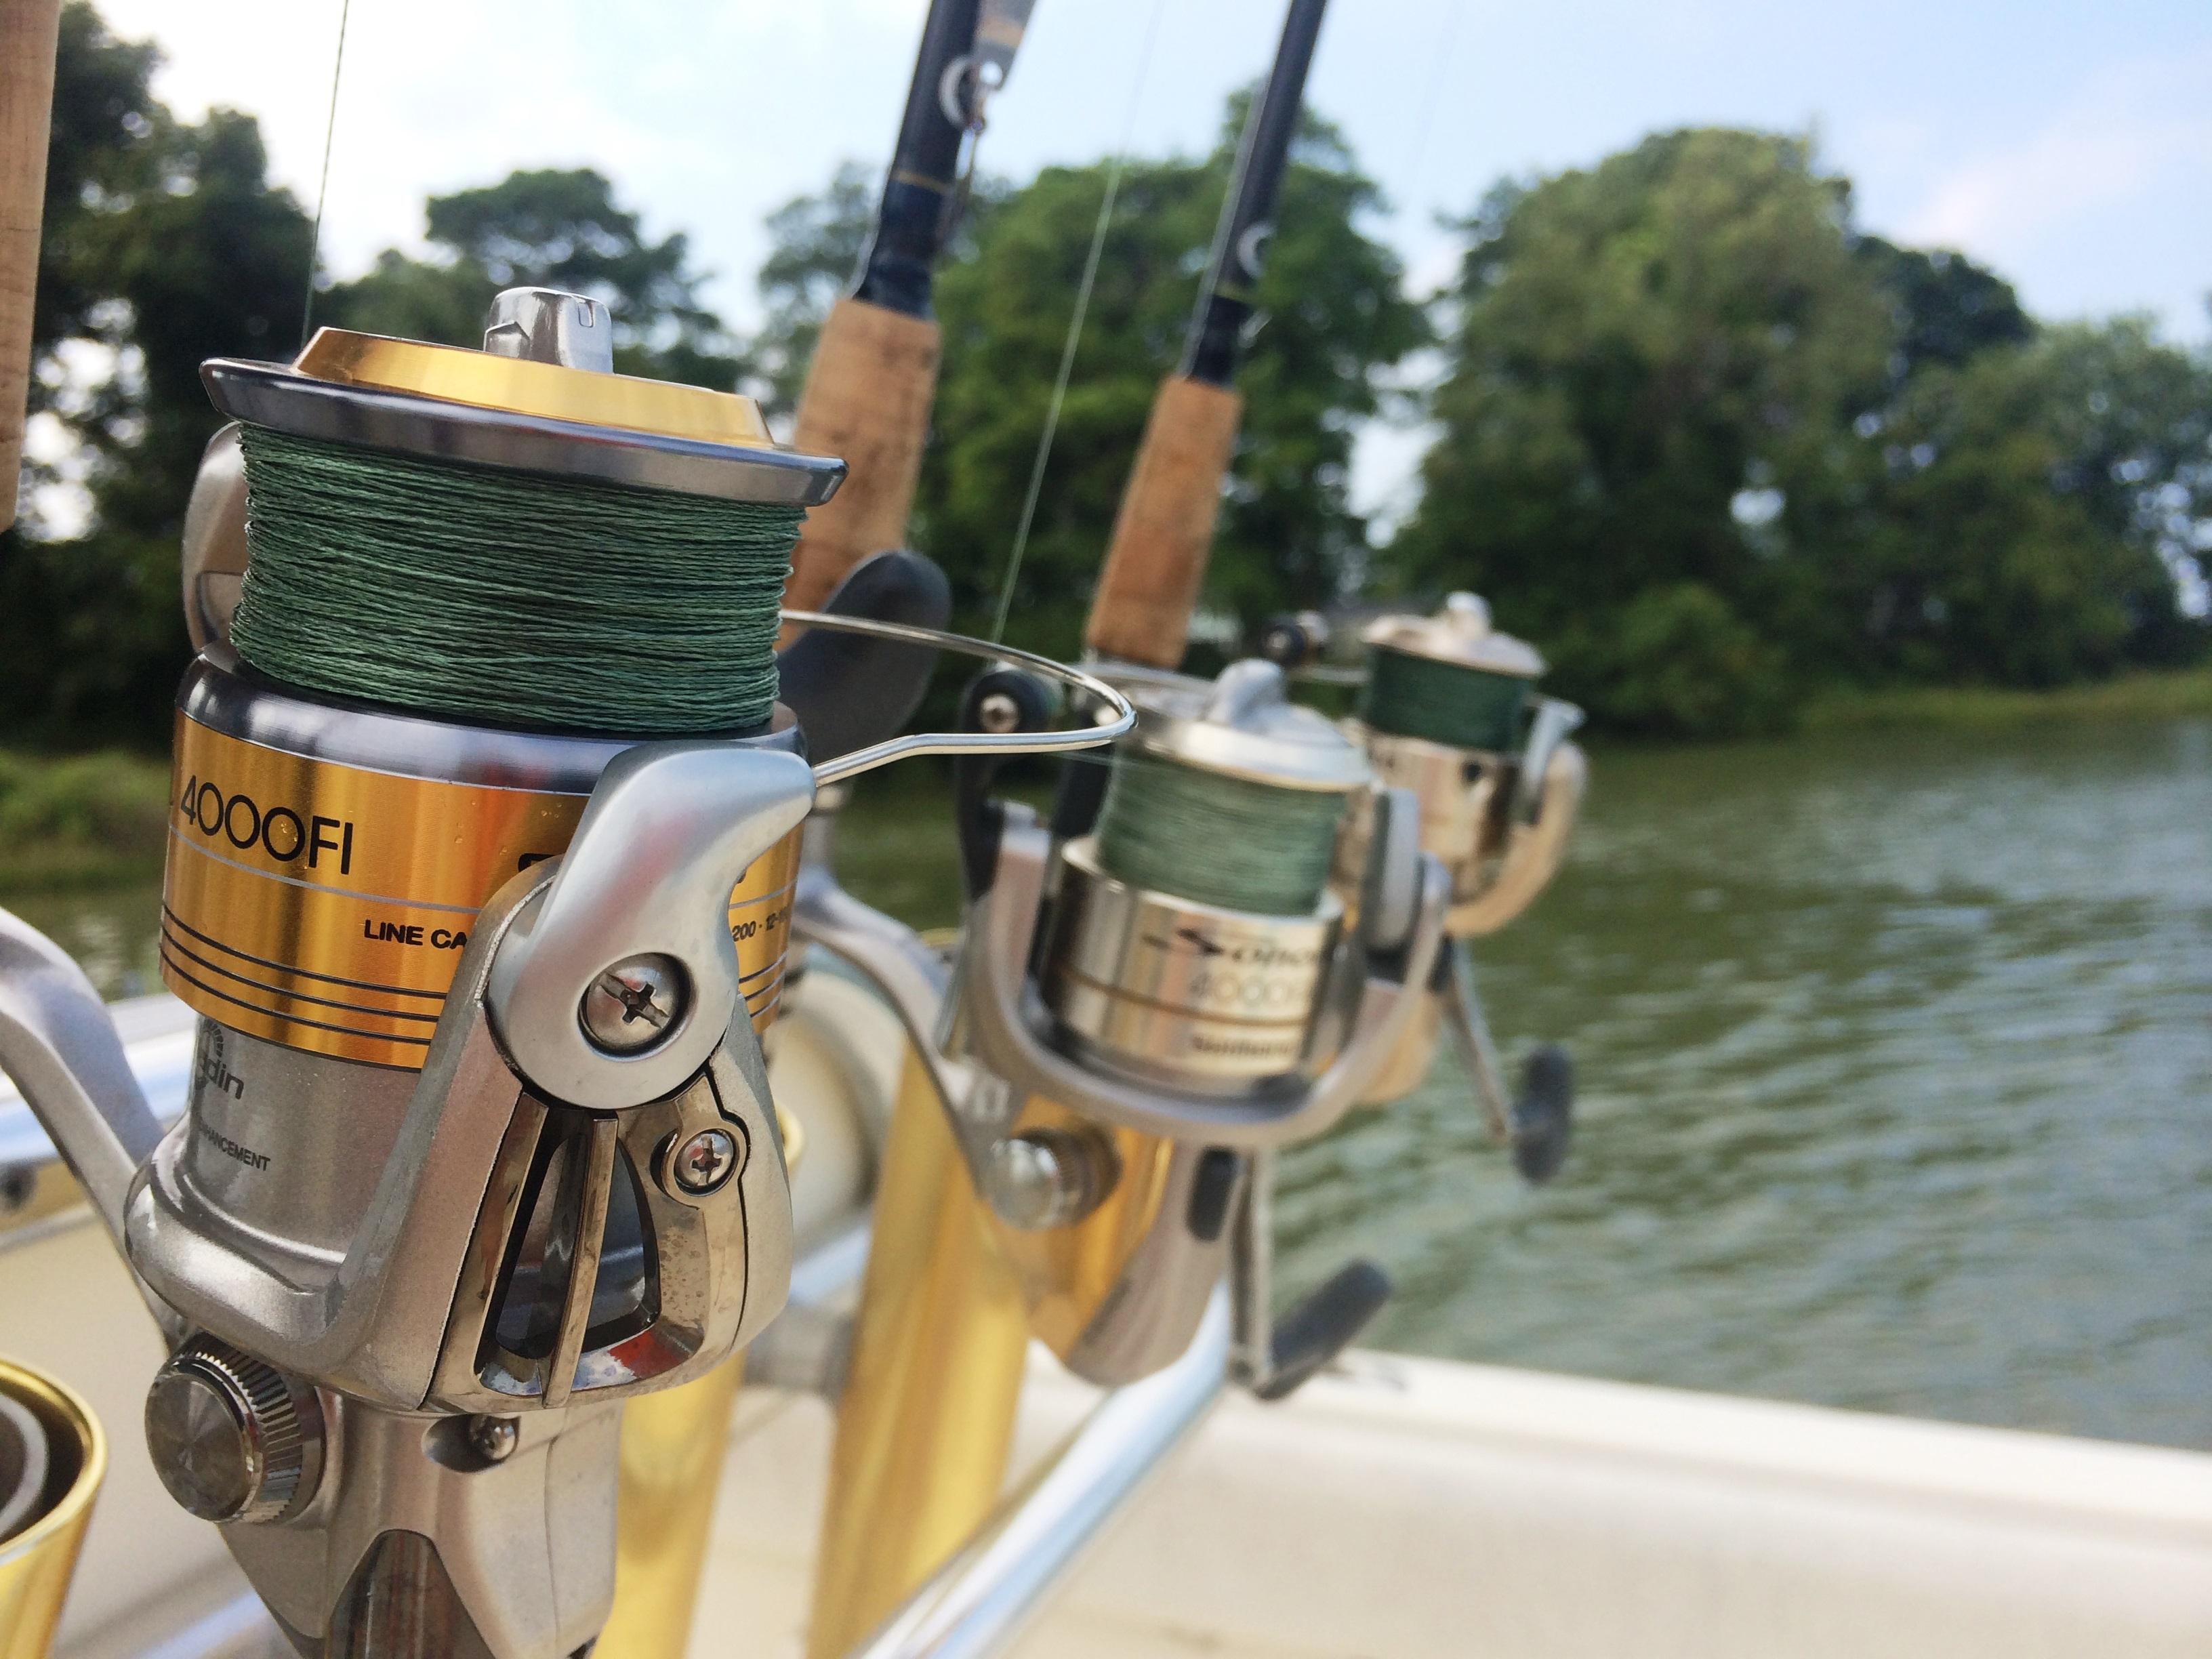 freshwater fishing gear - take me fishing, Fishing Rod